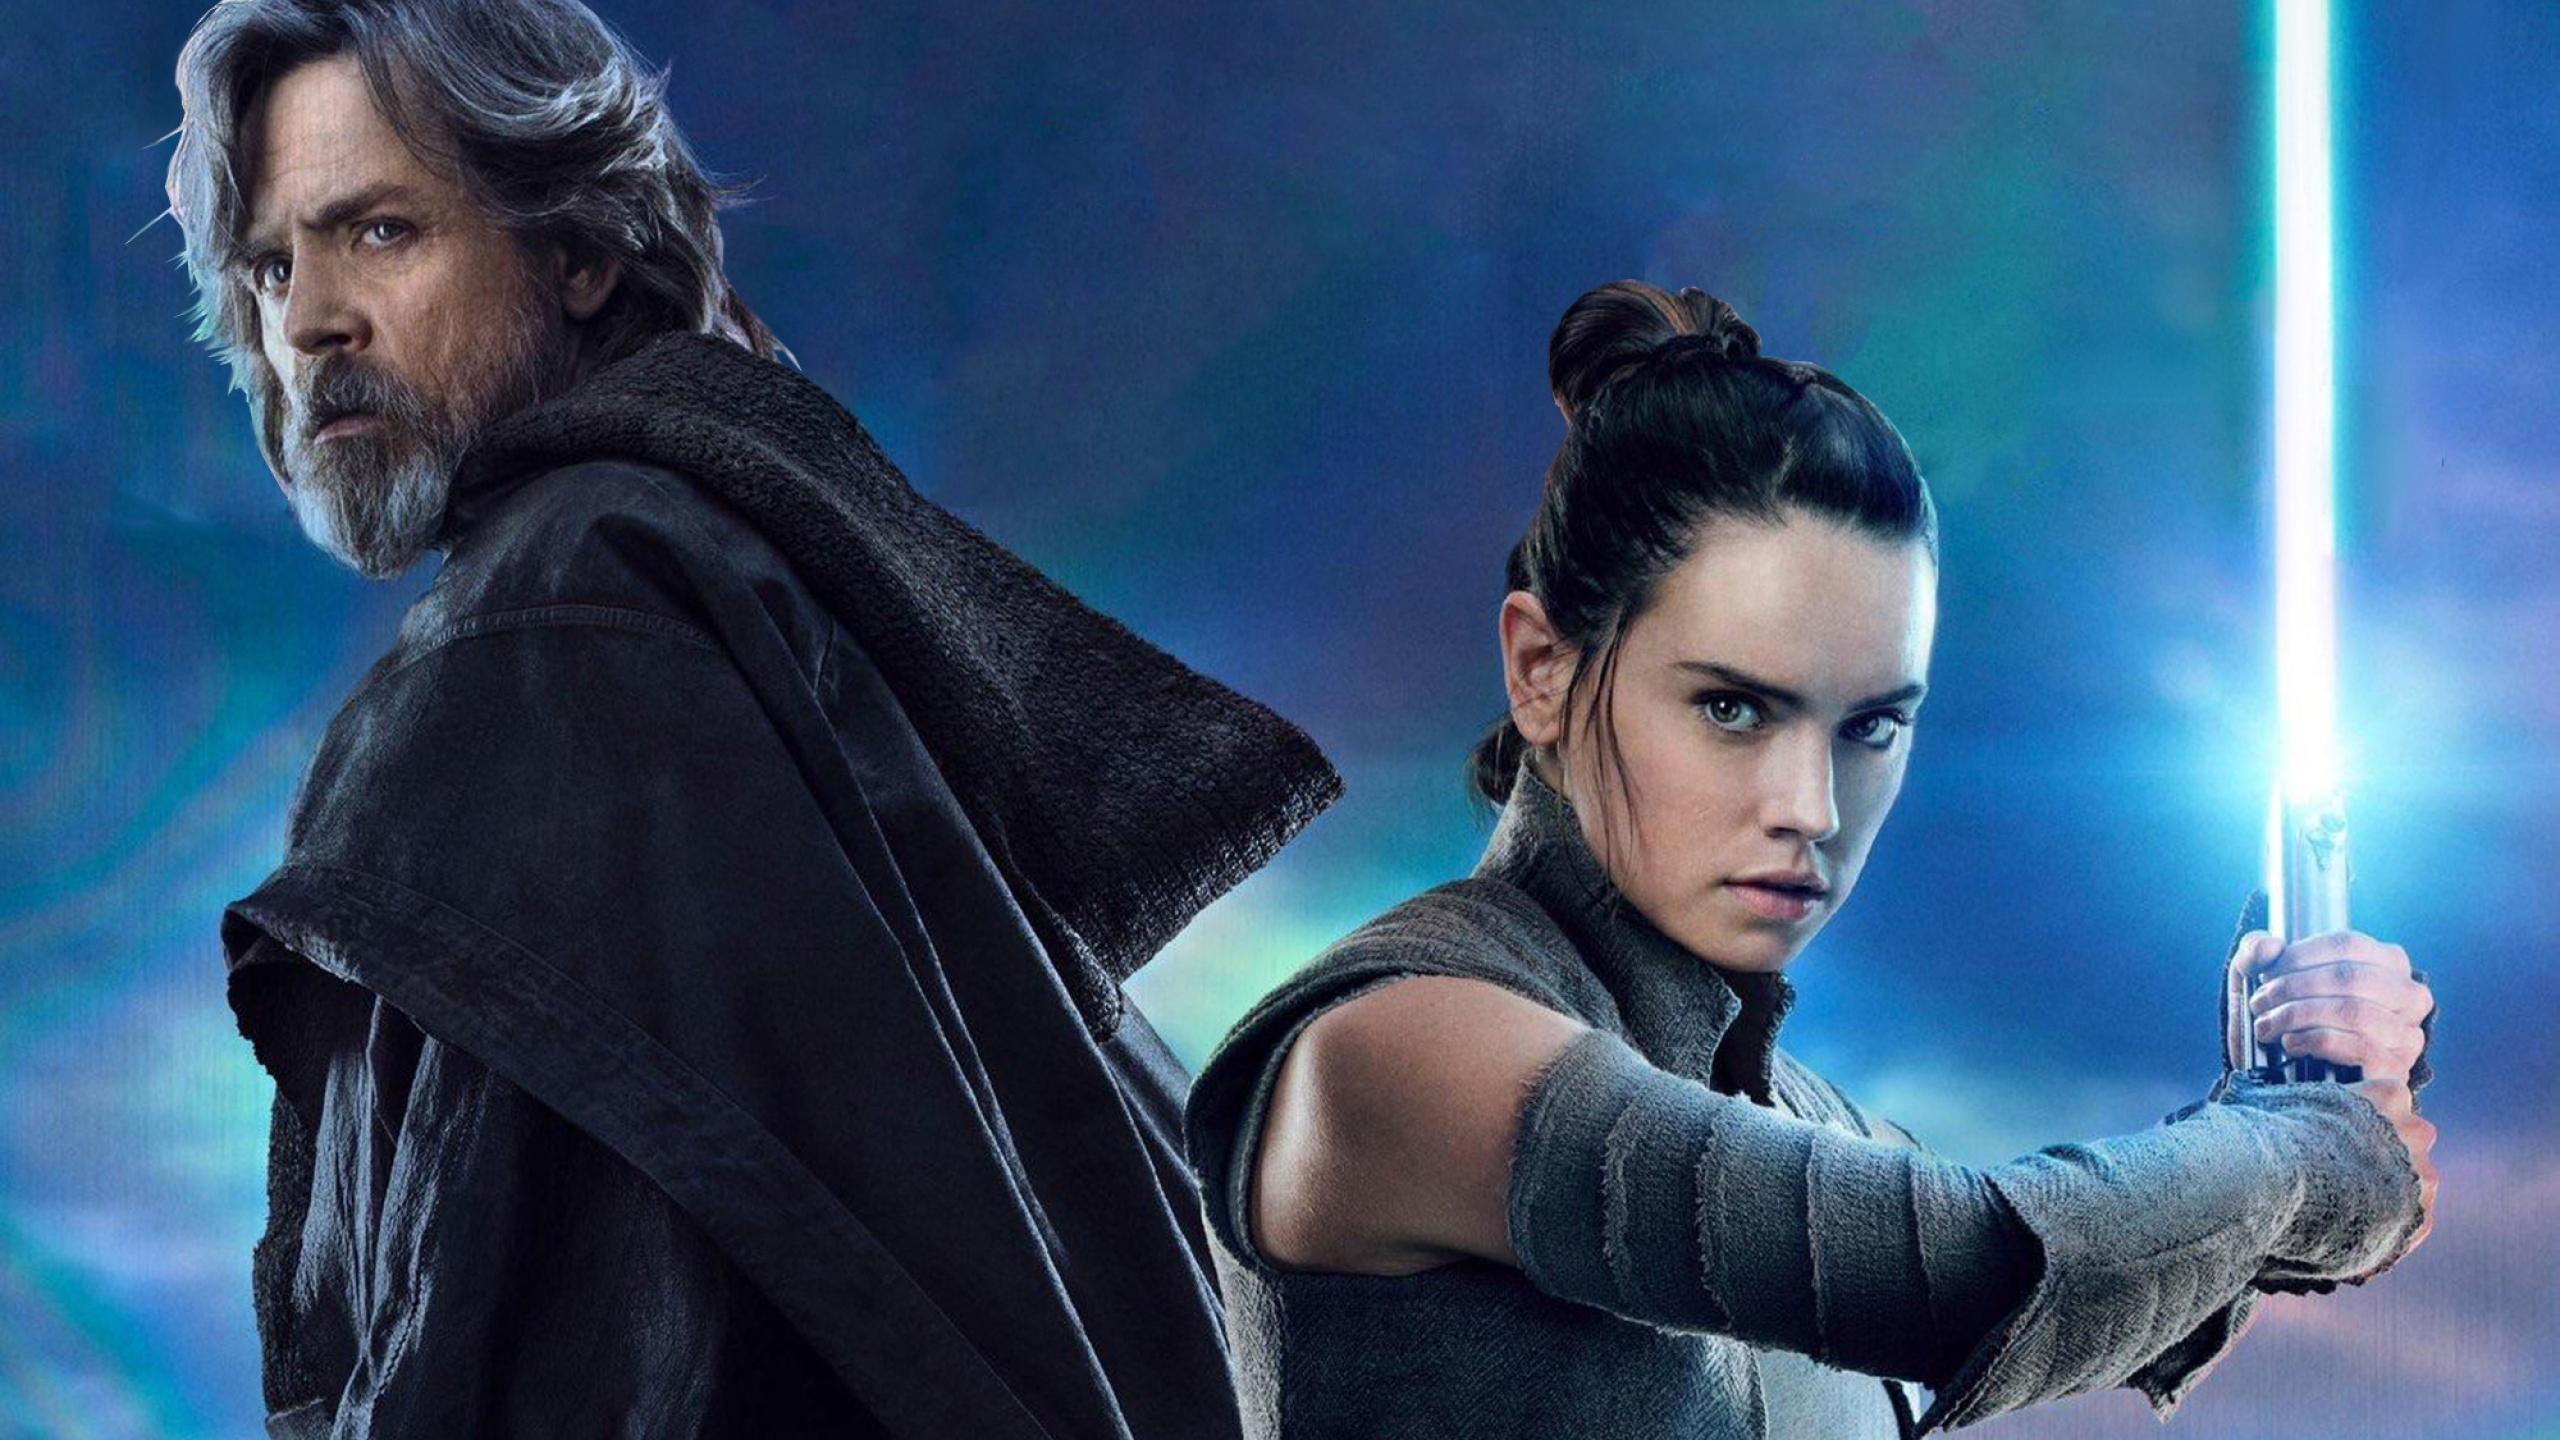 2560x1440 Rey And Luke Star Wars The Last Jedi 1440p Resolution